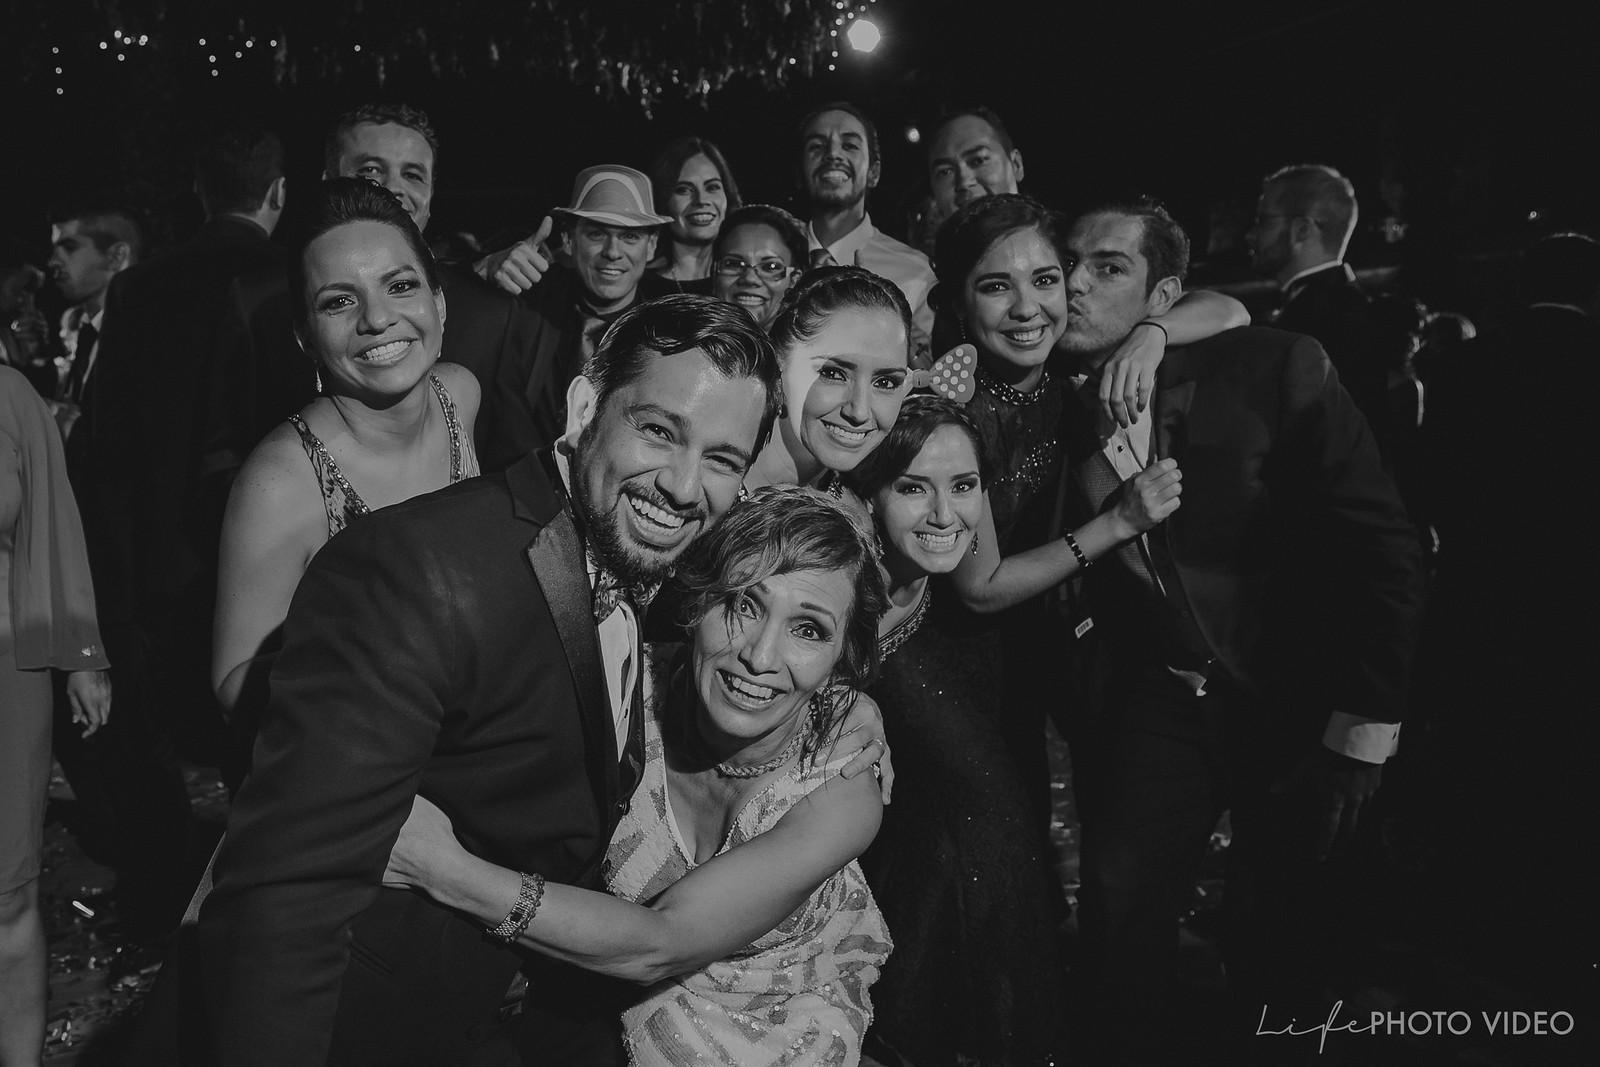 LifePhotoVideo_Boda_Guanajuato_Wedding_0069